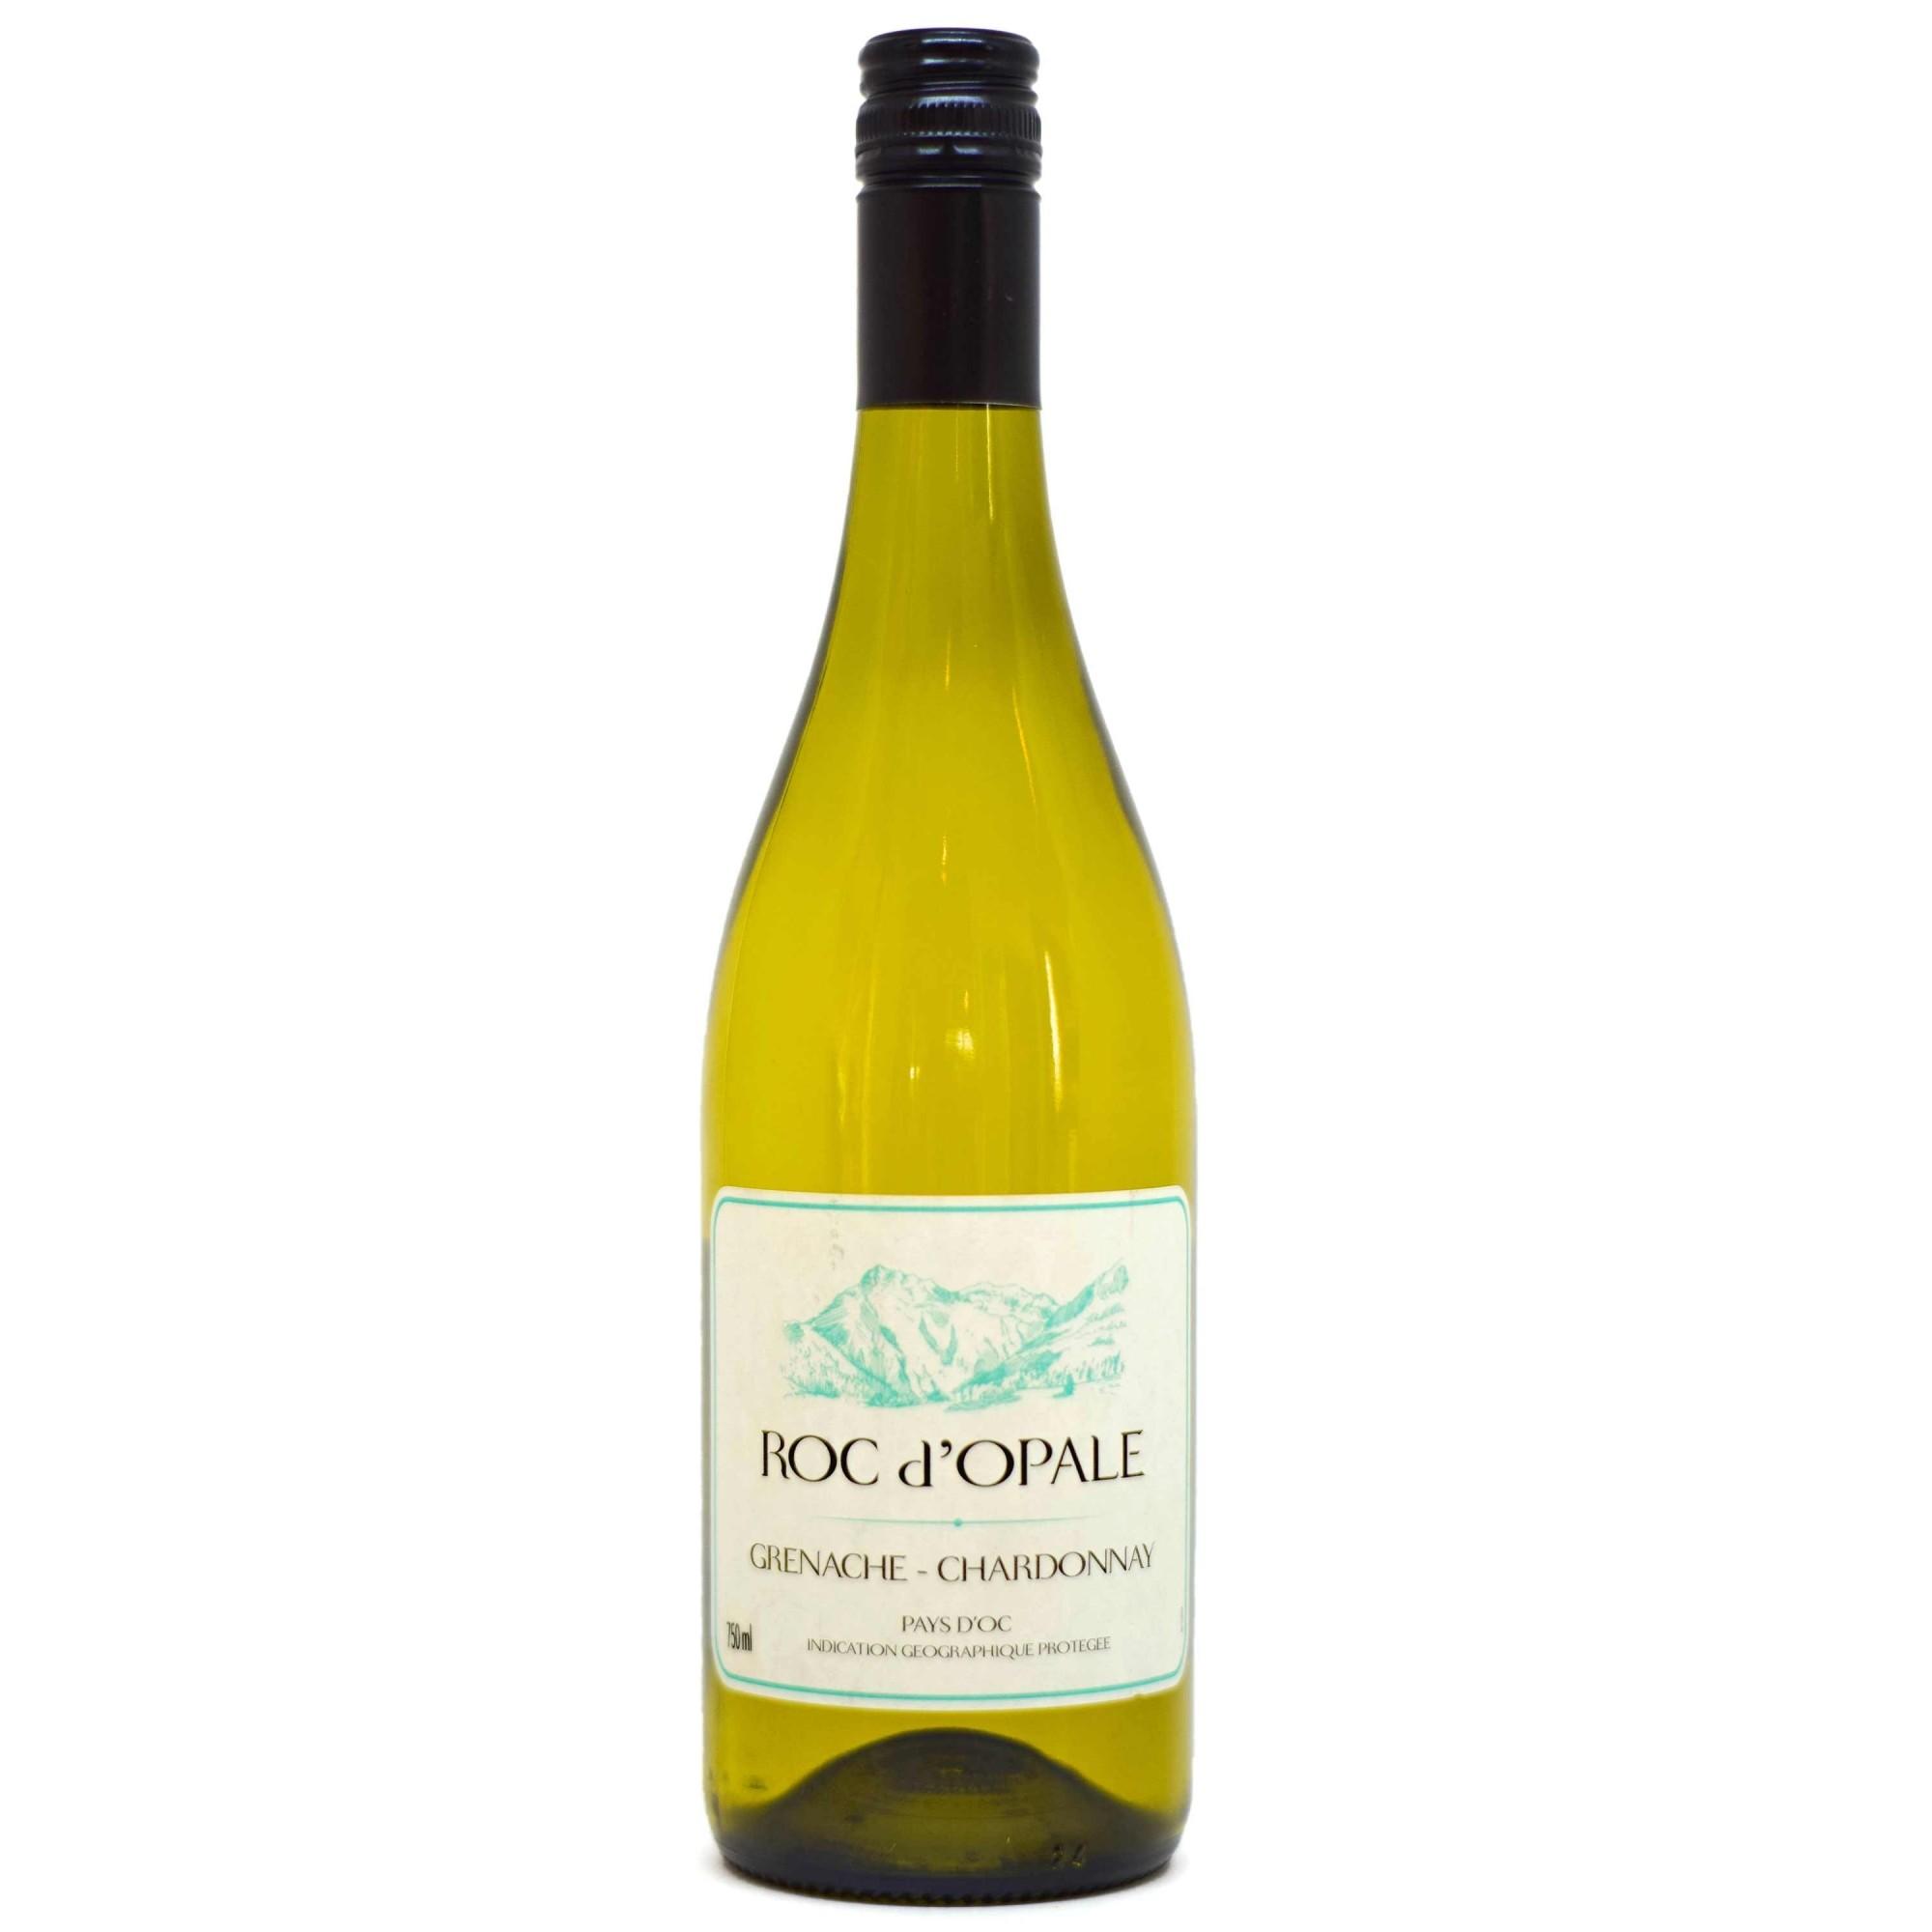 Roc D'Opale Grenache e Chardonnay